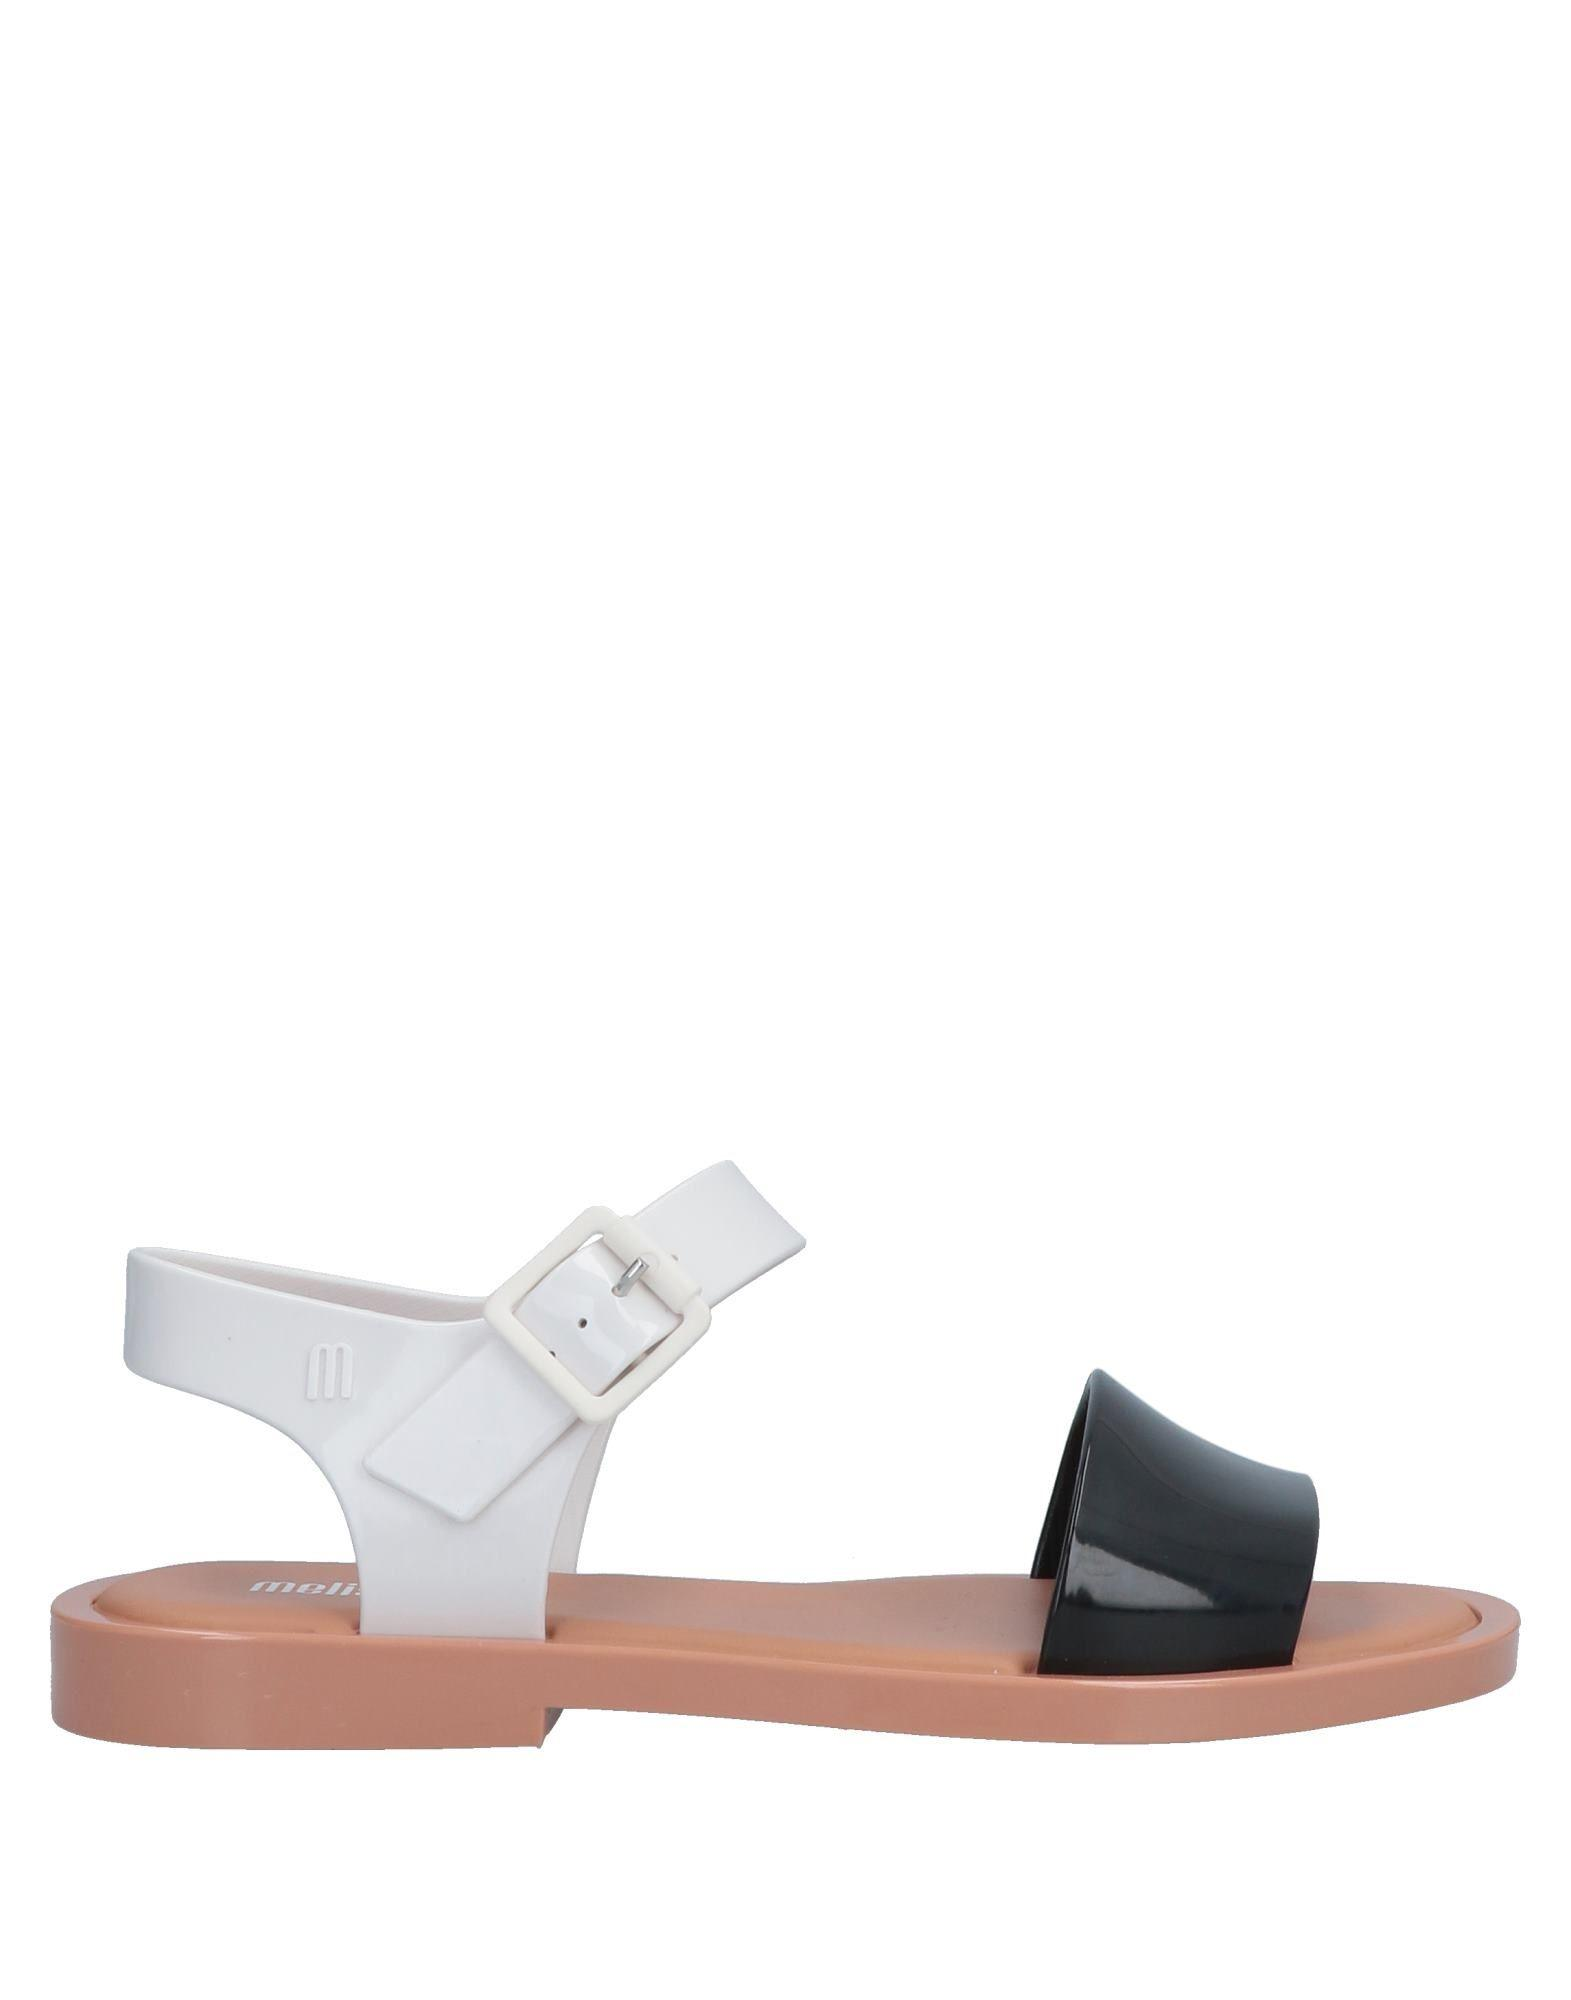 0a9d89b5b158a Lyst - Melissa Sandals in Black